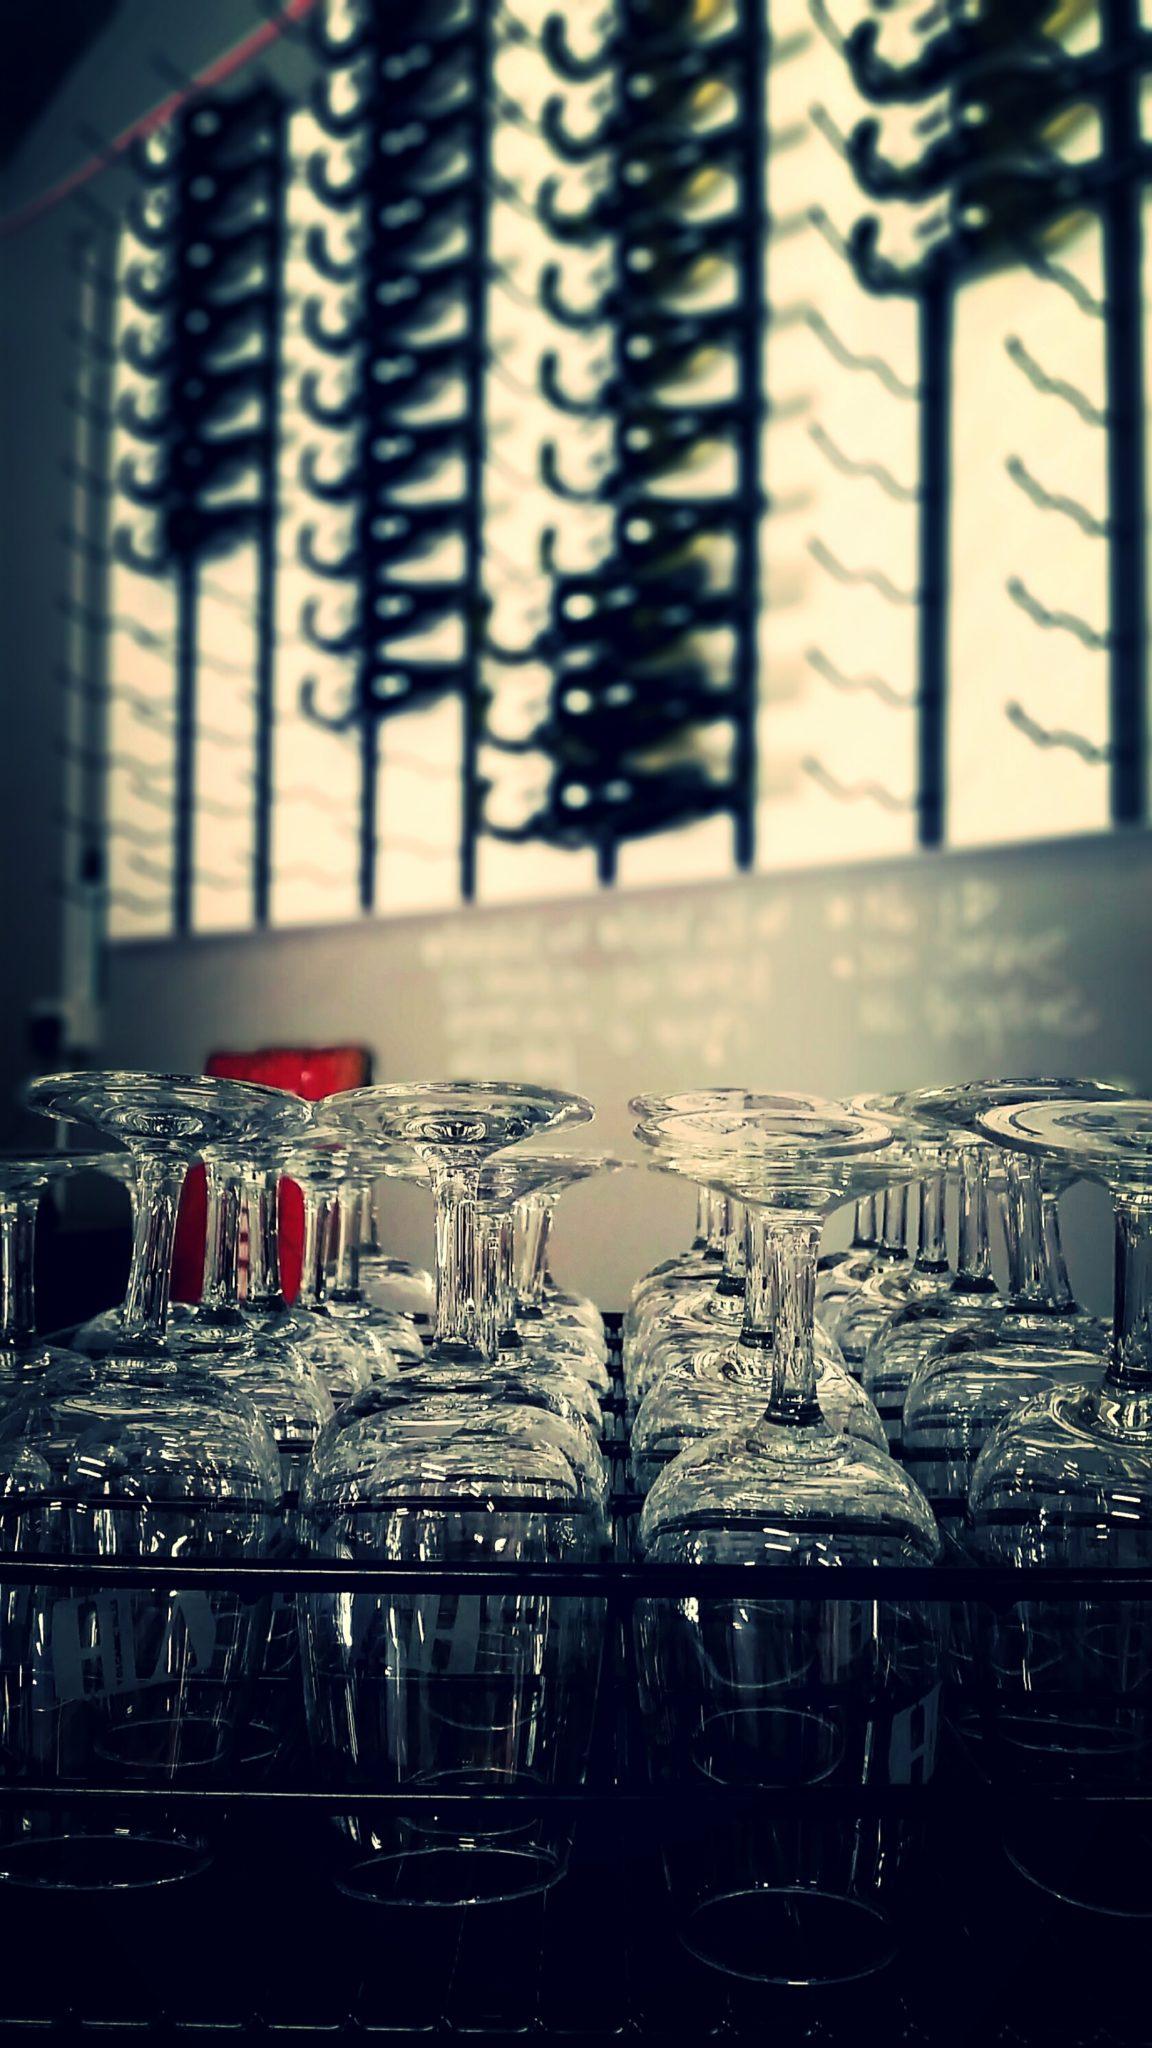 KD Winery Glasses & Wine Wall